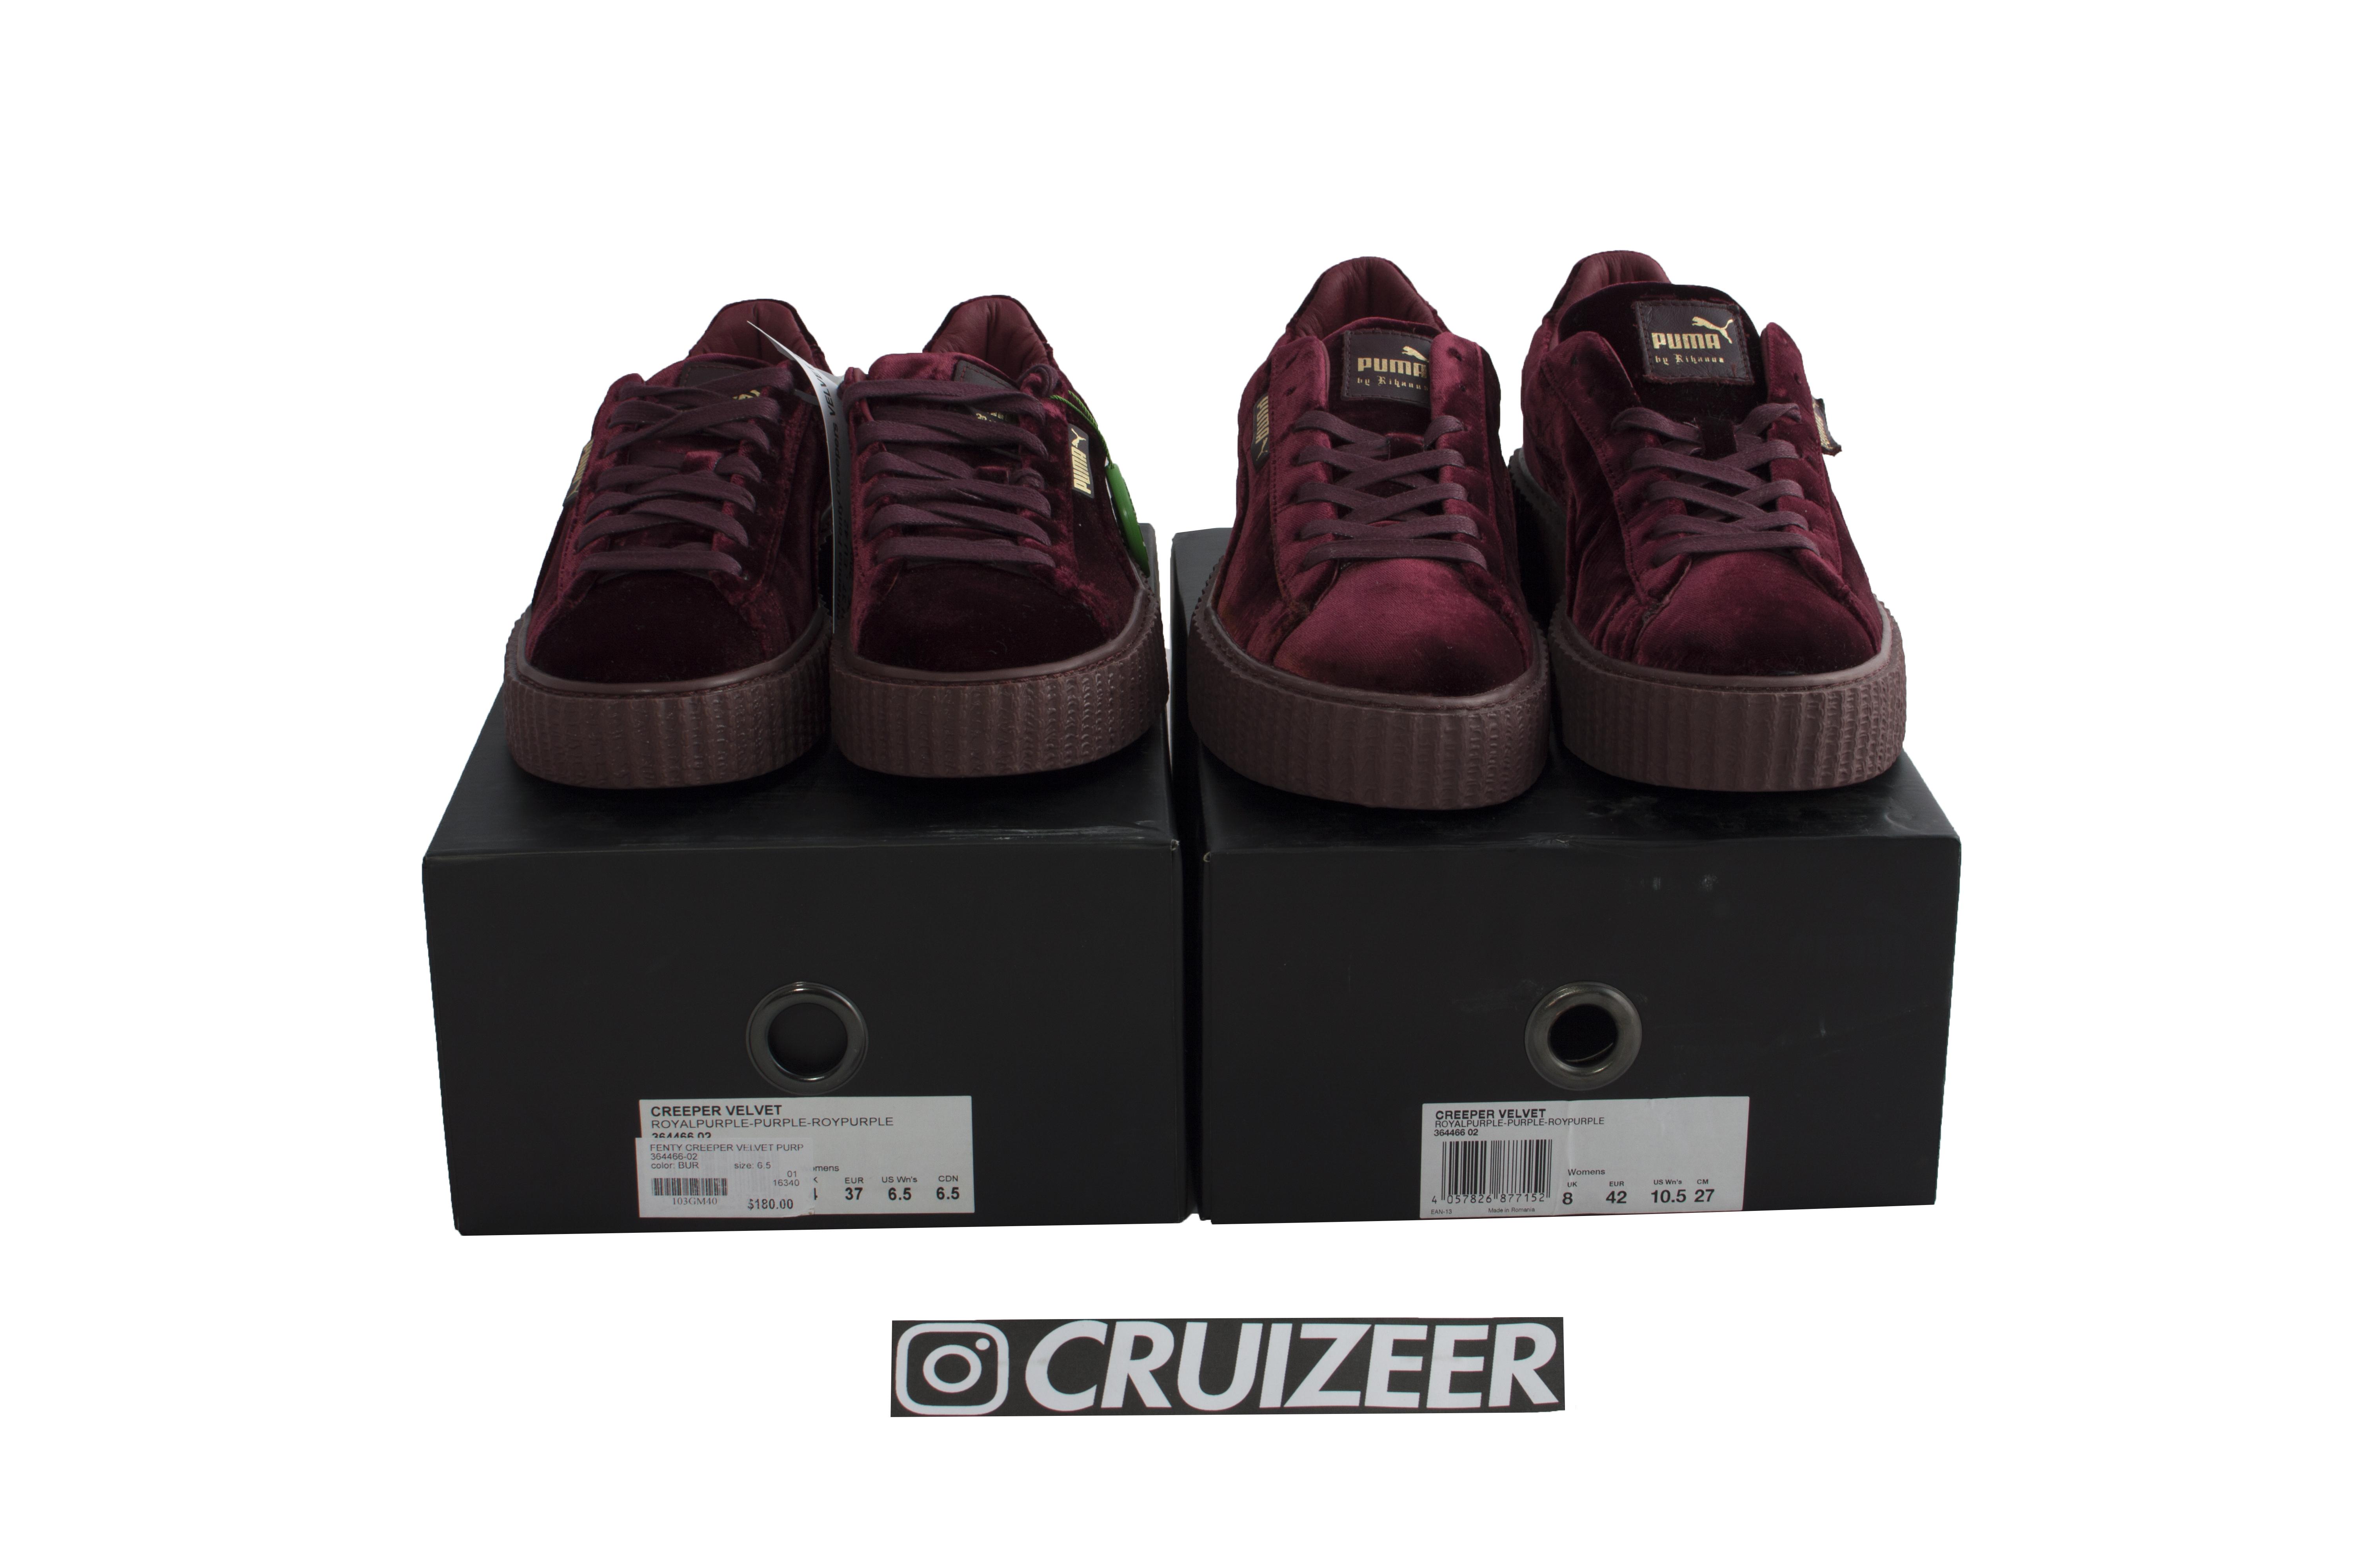 a351f7c4c182 Puma X Rihanna Puma Creepers X Rihanna Fenty Velvet Purple (us 10